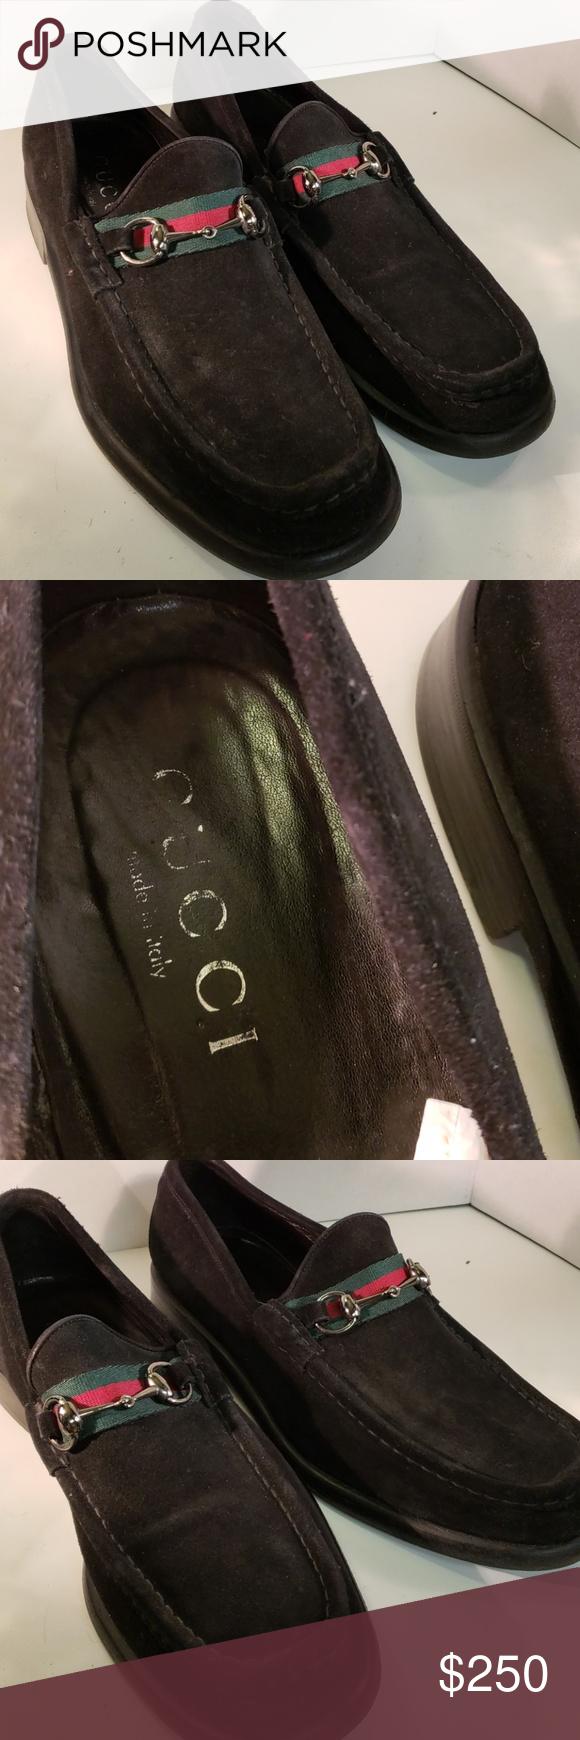 55bceb3f Vintage Men's Authentic Gucci Suede Loafers 12.5 Great Vintage Black ...